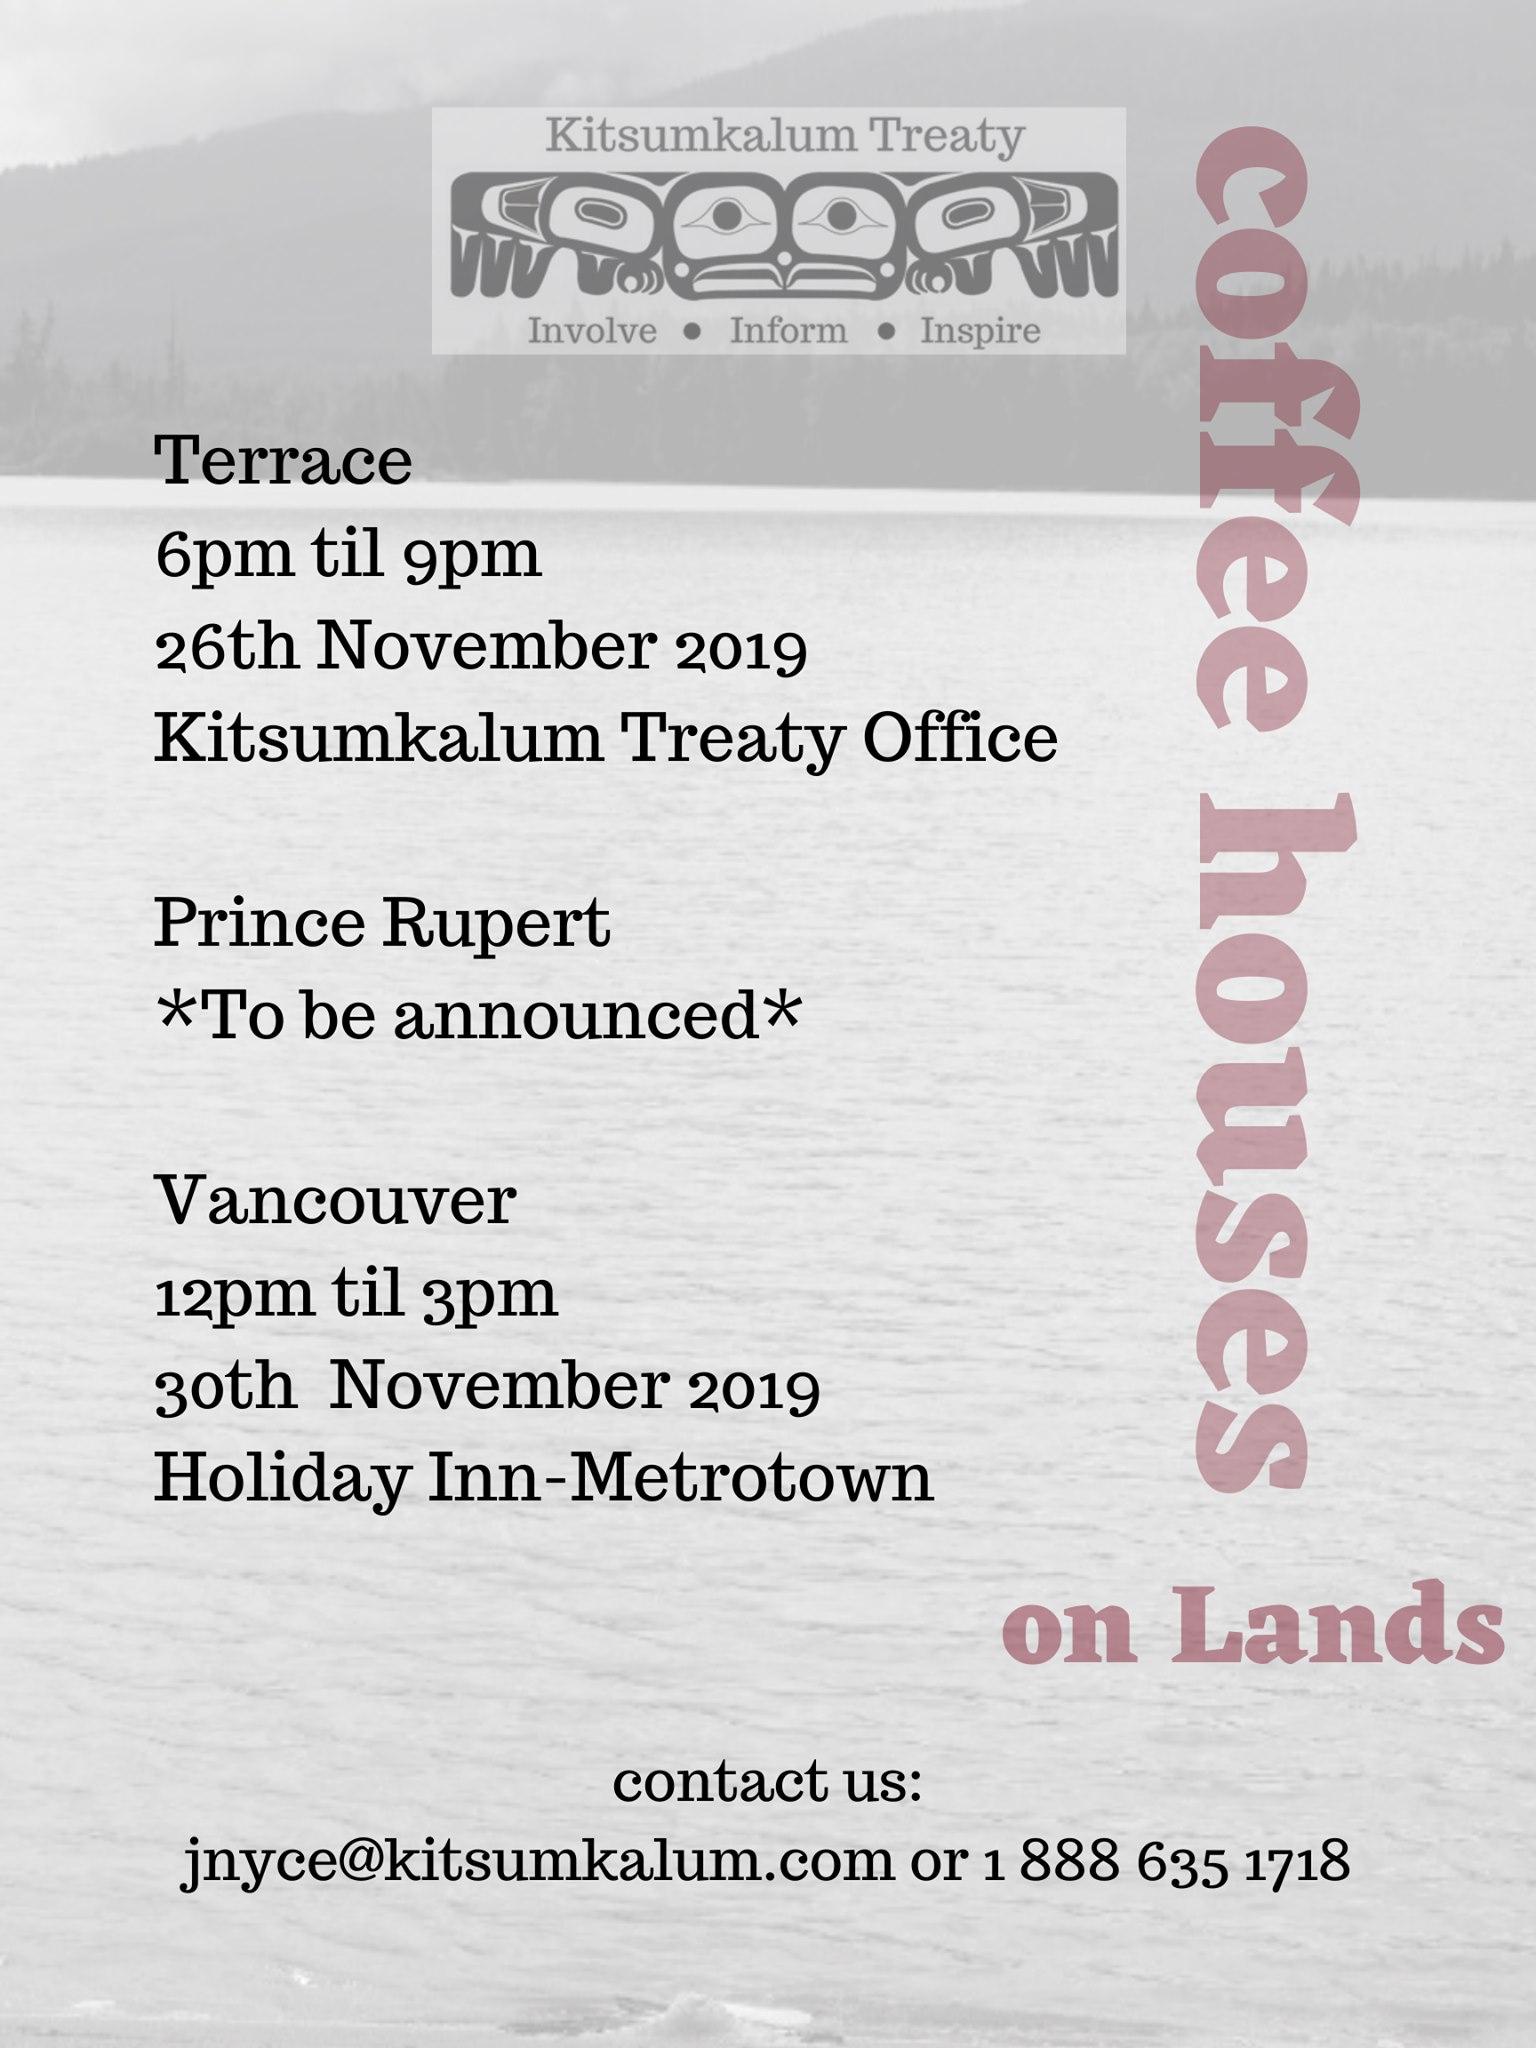 Treaty Coffee Houses in November